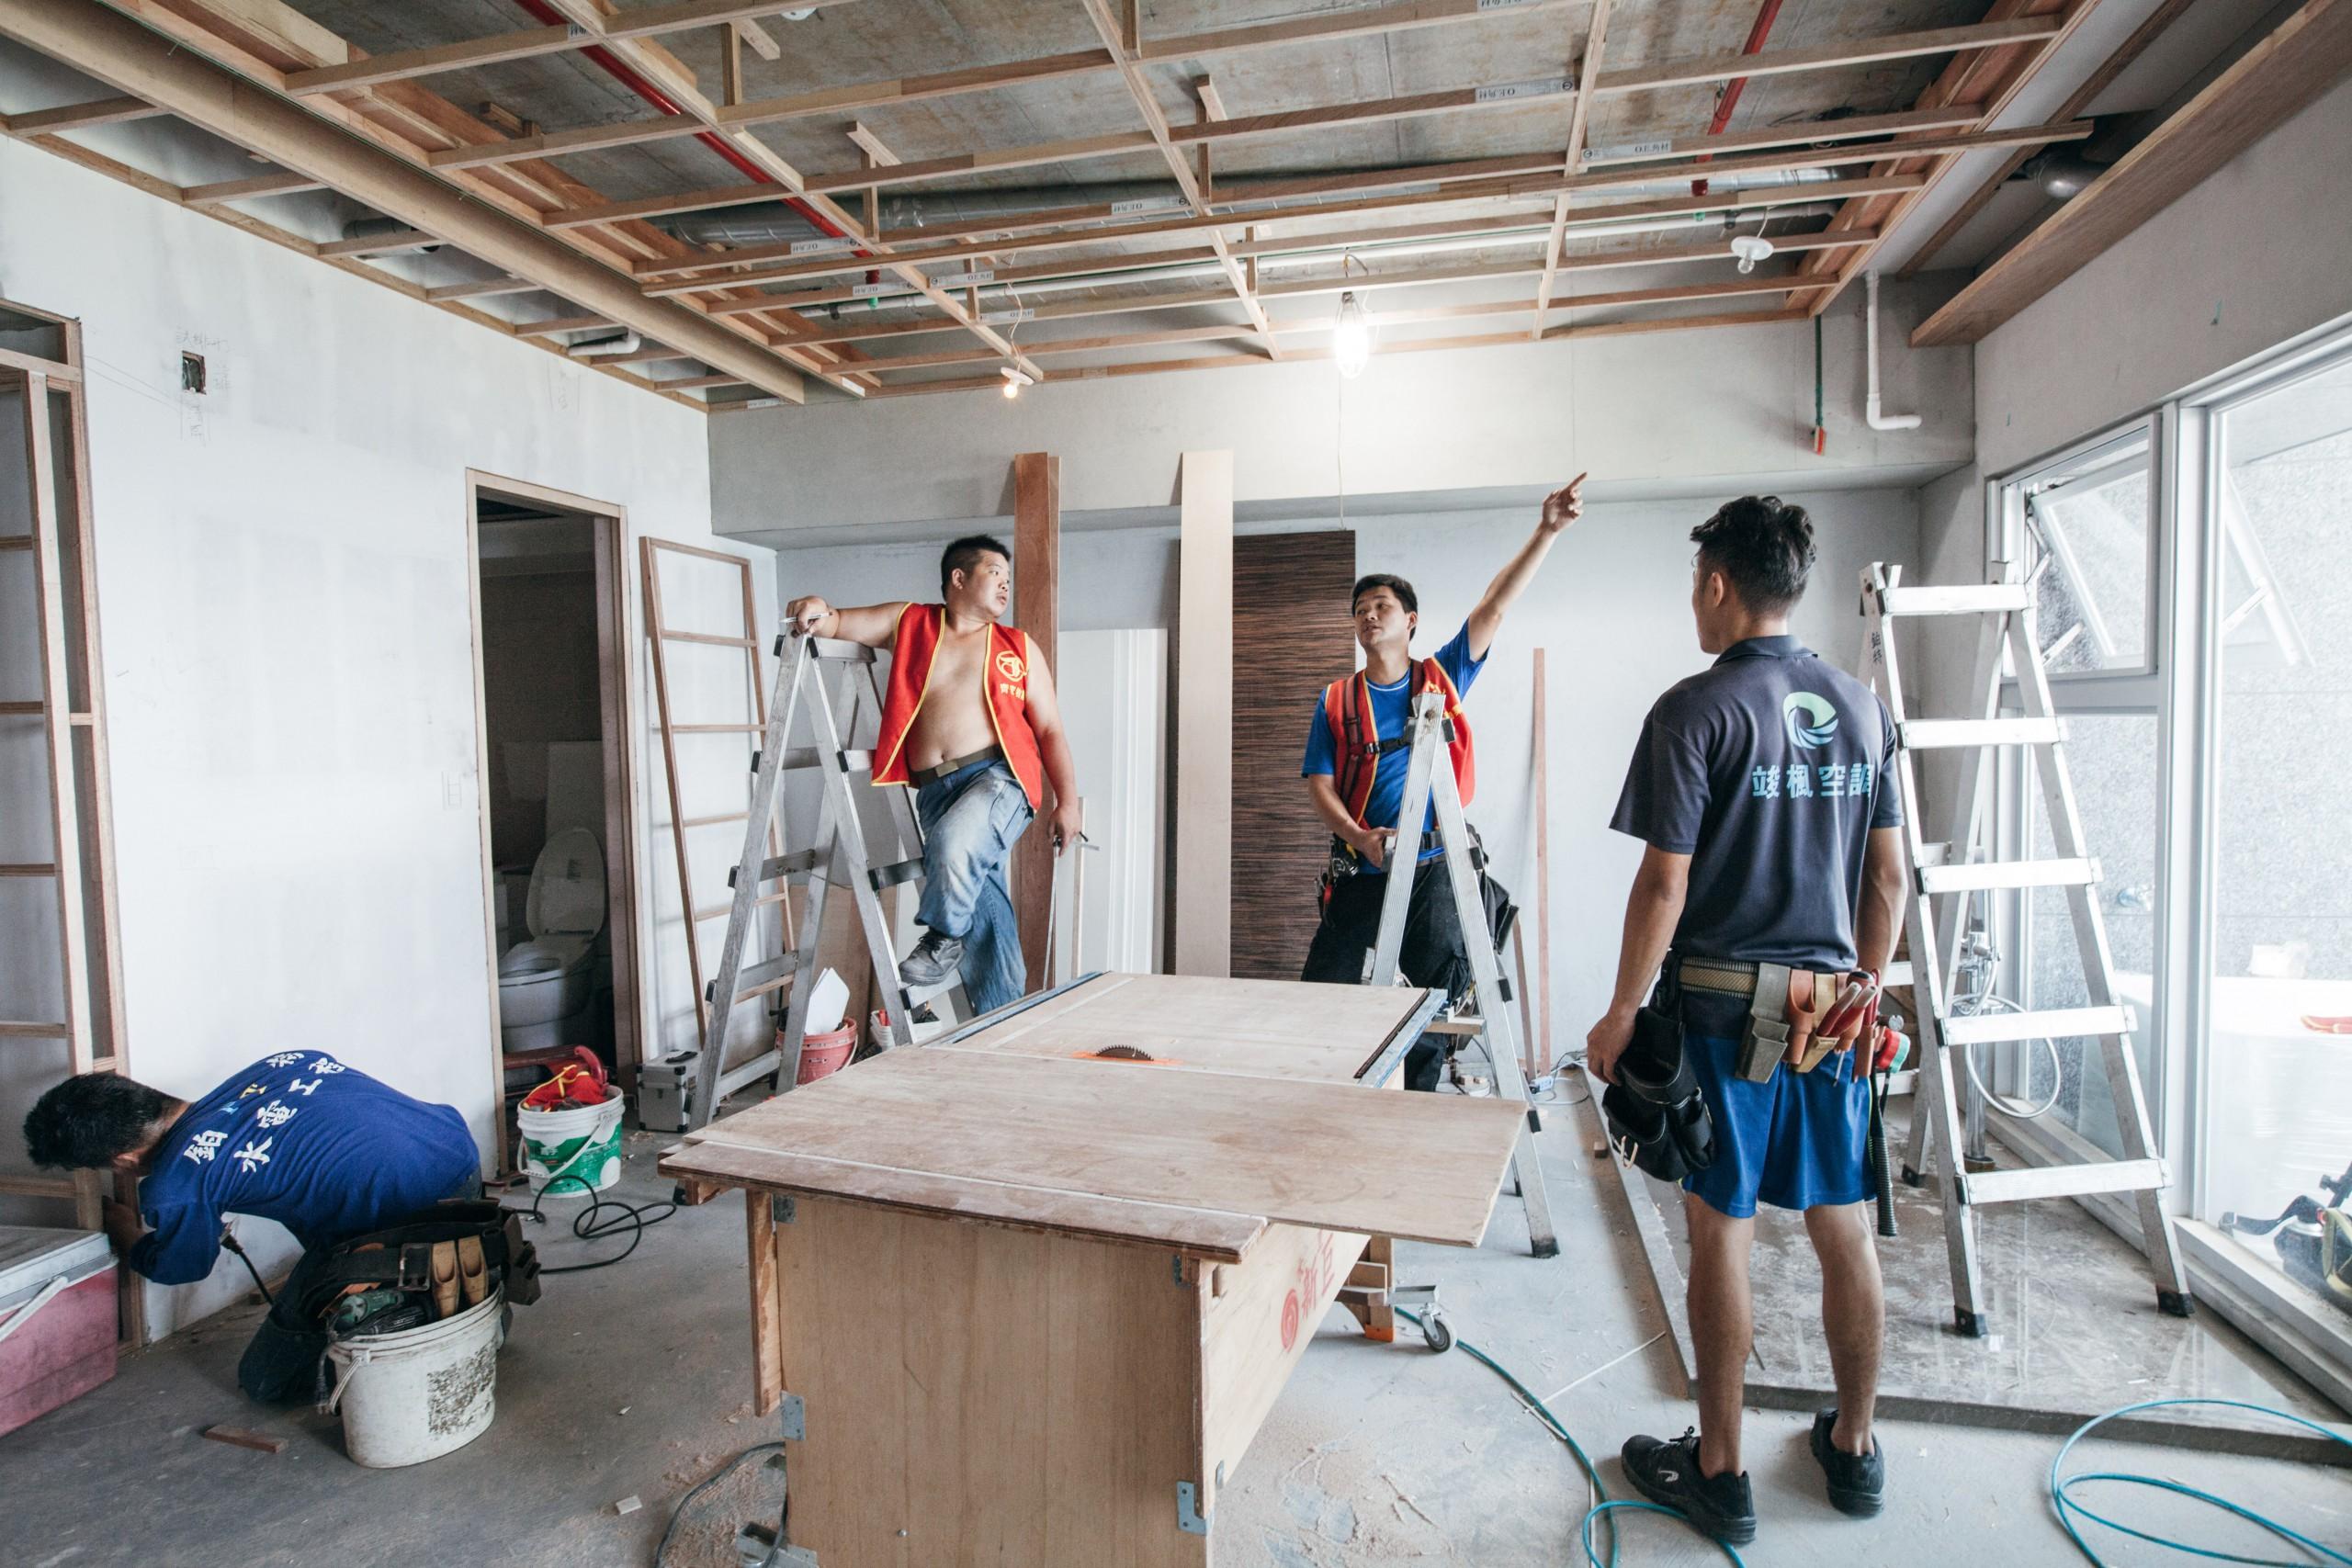 德築-DEZU-project-世界灣自宅裝修-architecture-interior-renovation-1